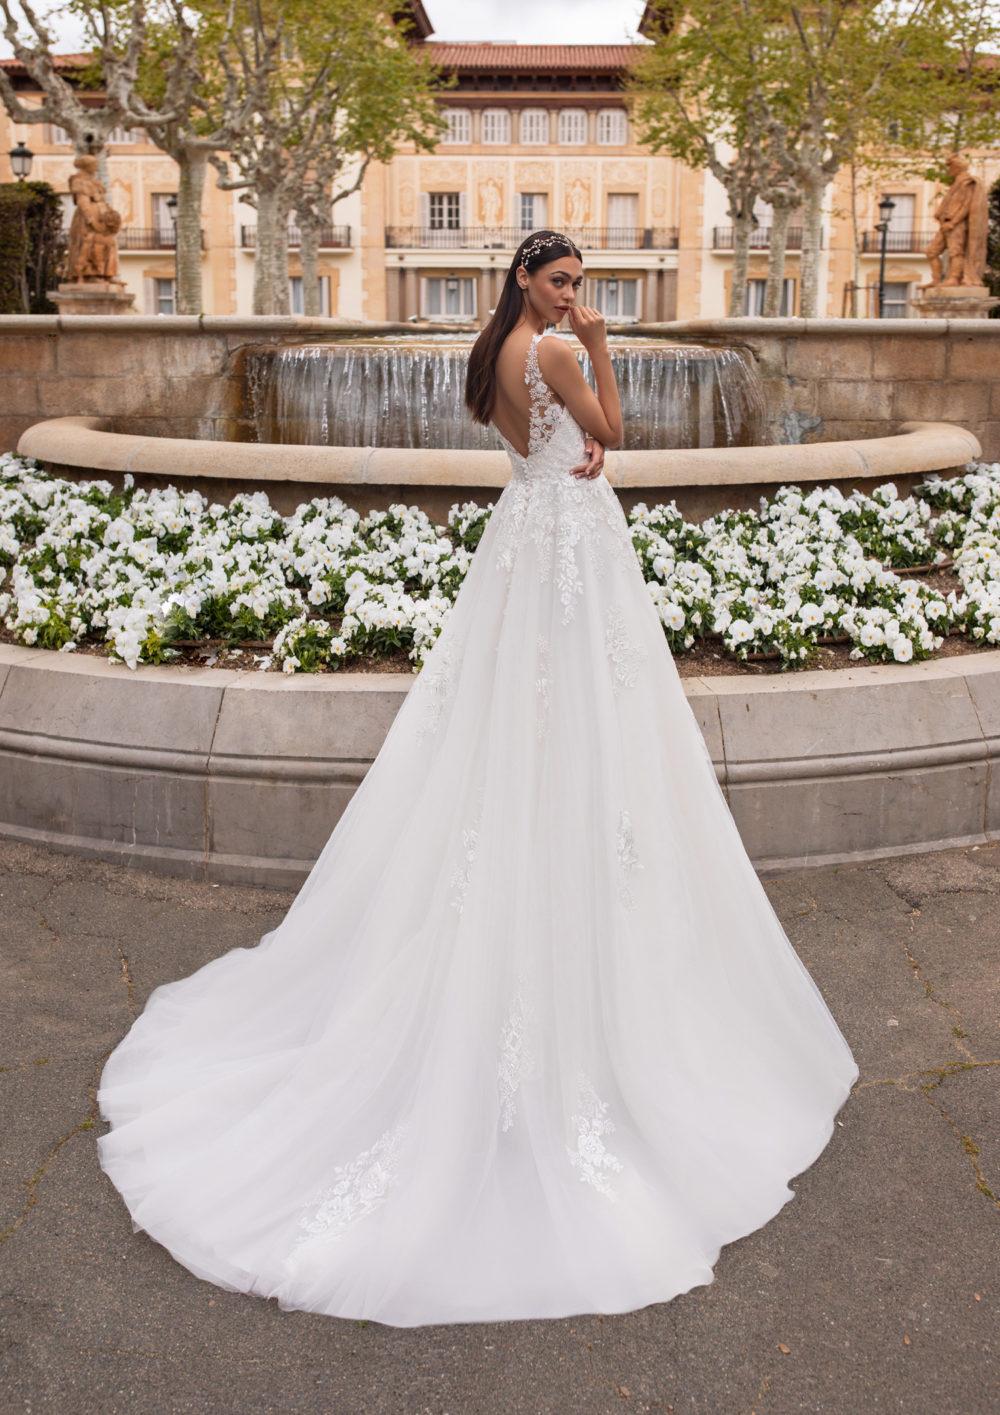 Mariages: abito da sposa Pronovias 2020 a Vicenza, Verona, Padova, Veneto NEMO